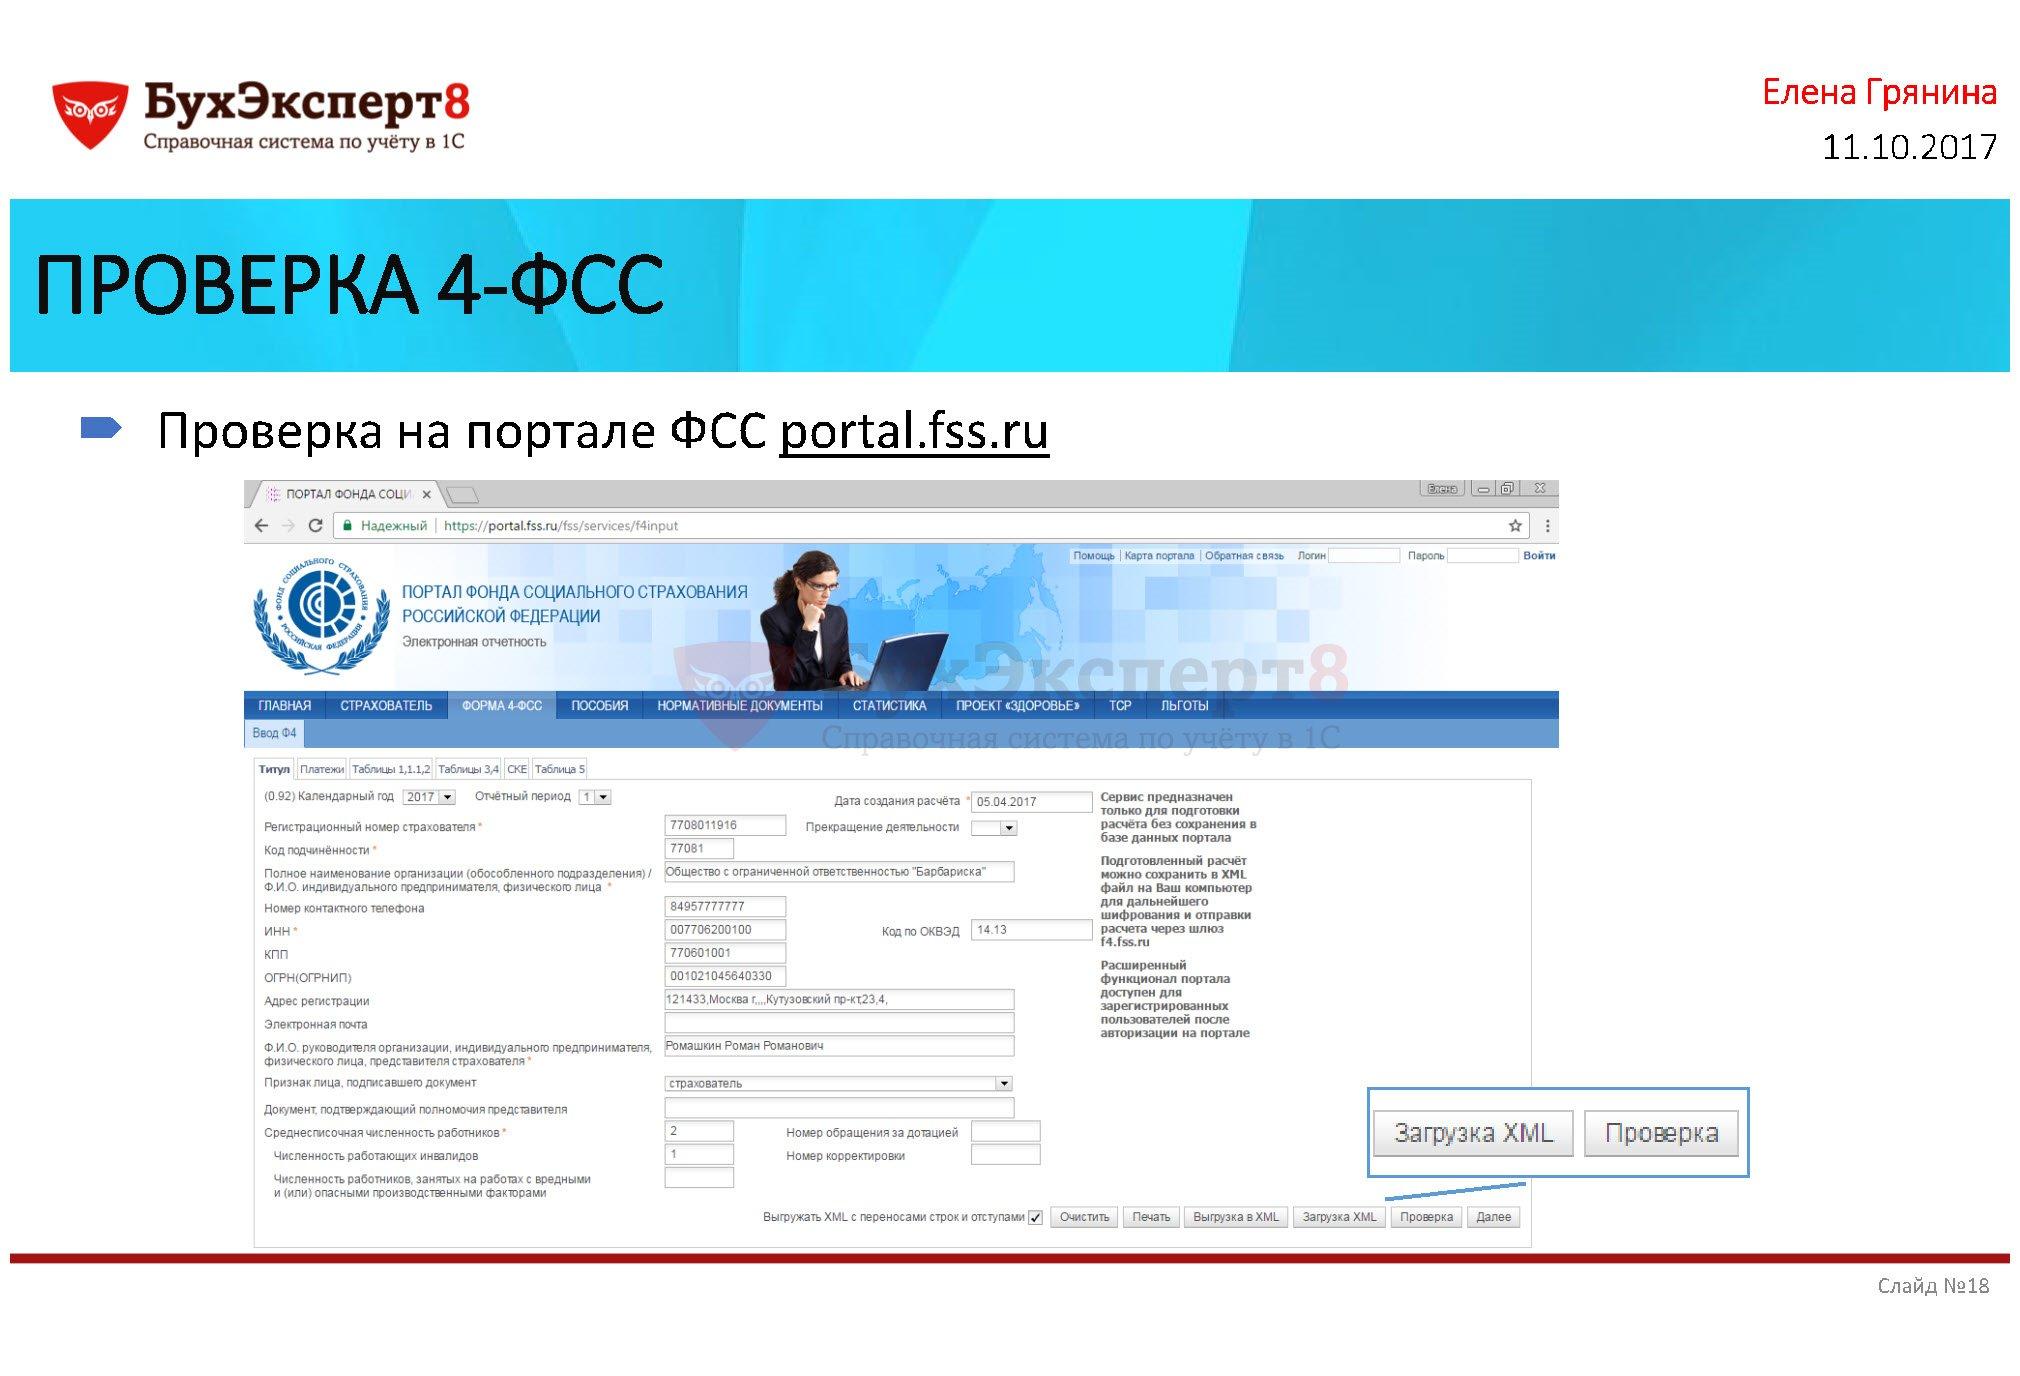 ПРОВЕРКА 4-ФСС Проверка на портале ФСС portal.fss.ru